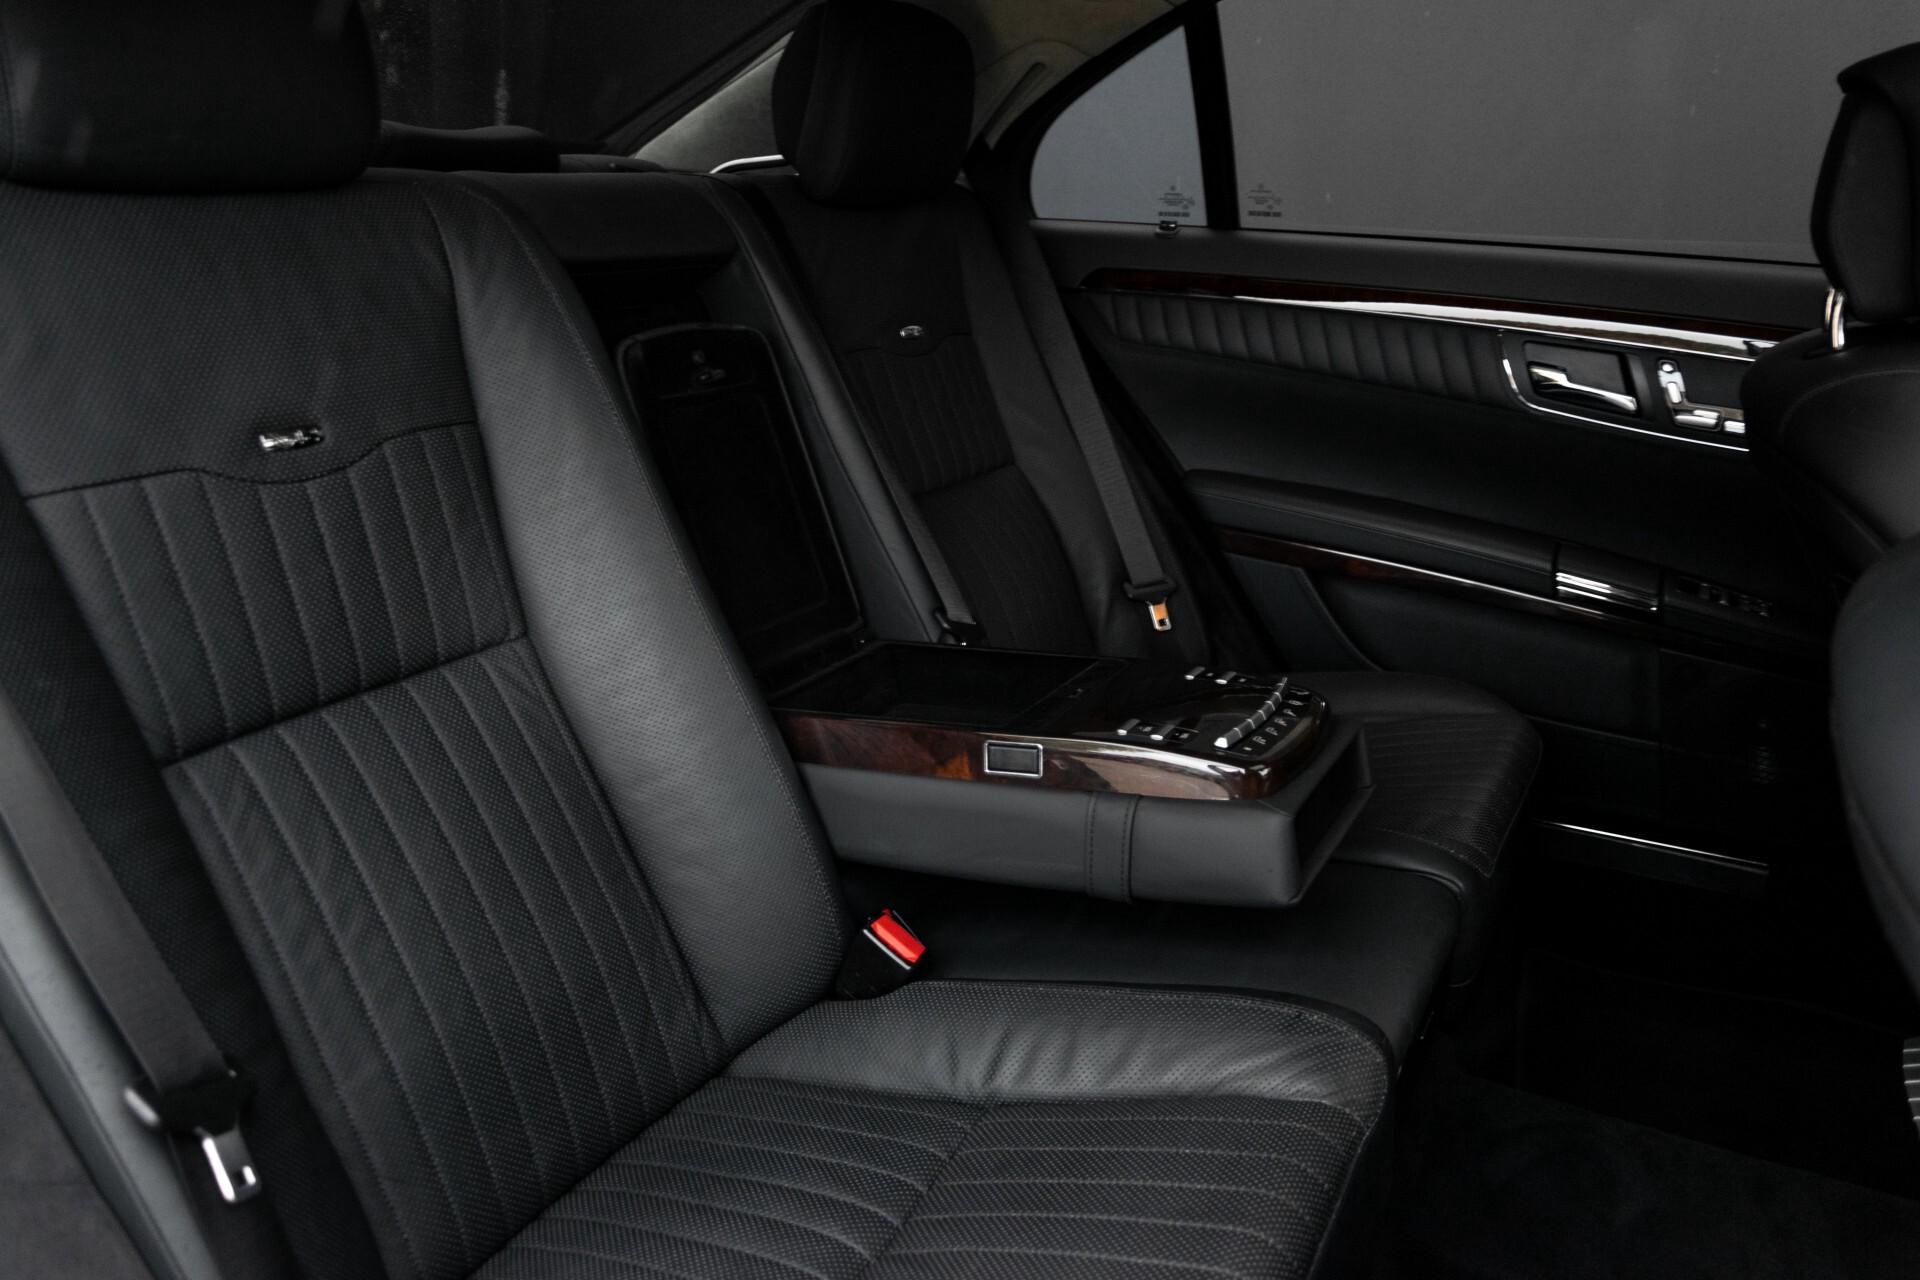 Mercedes-Benz S-Klasse 600 Lang 65 AMG Bi-Turbo Prestige Plus Aut5 Foto 6